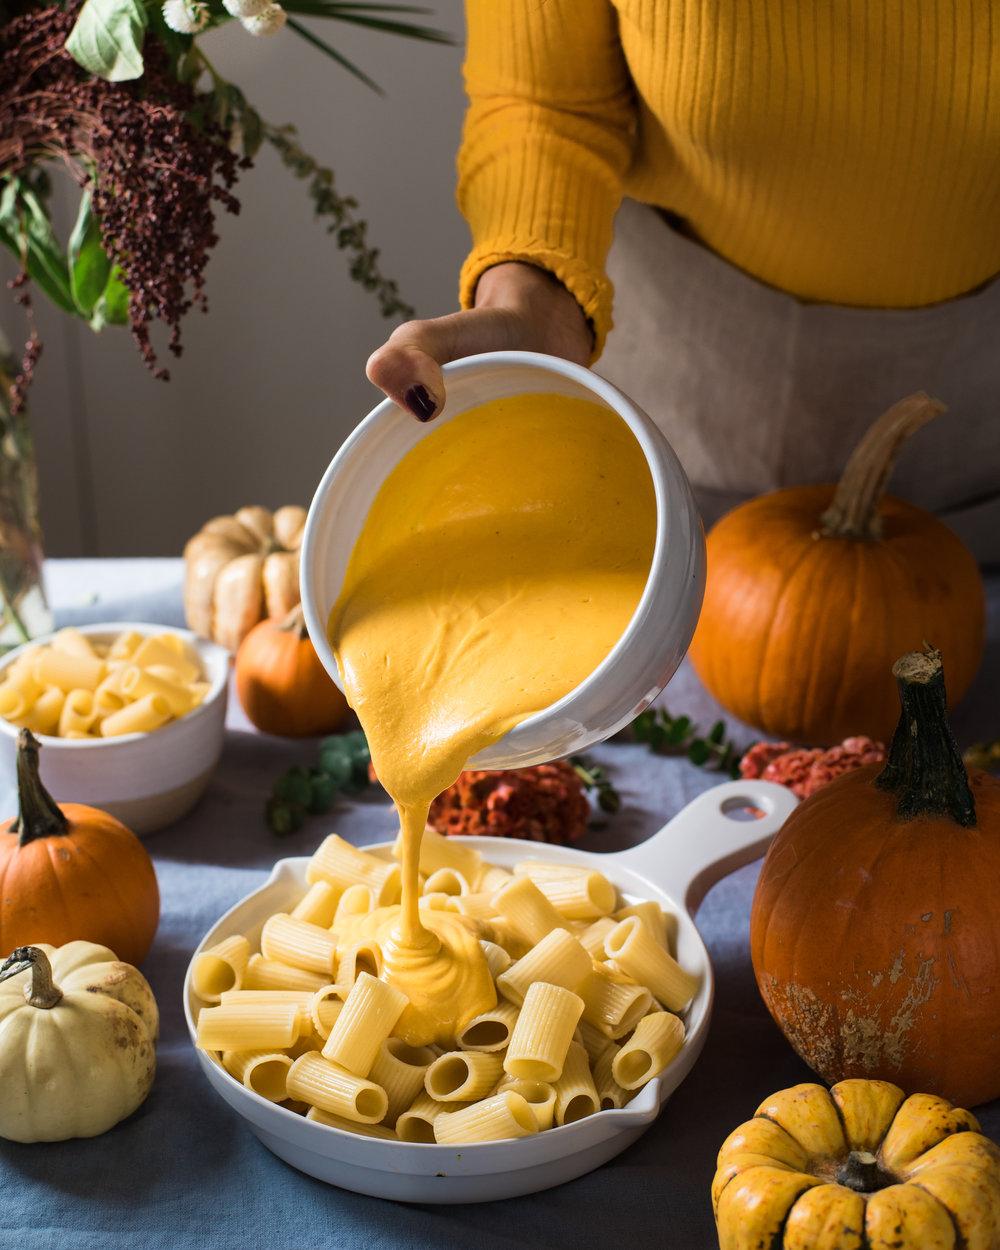 beet pasta 2 plates hands - lm (1 of 1).jpg